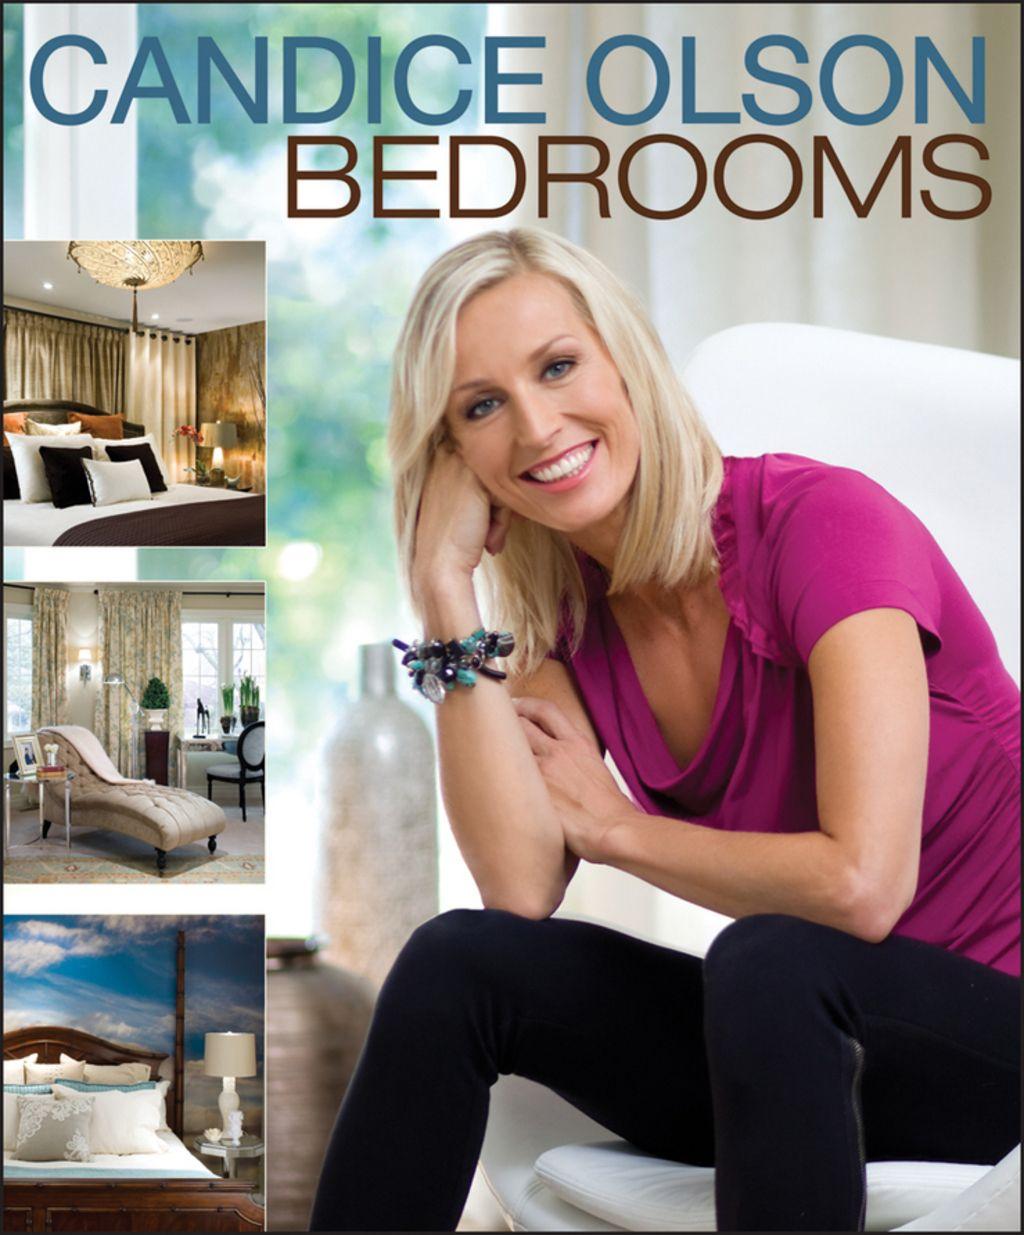 Candice Olson Bedrooms Ebook Romantic Bedroom Design Candice